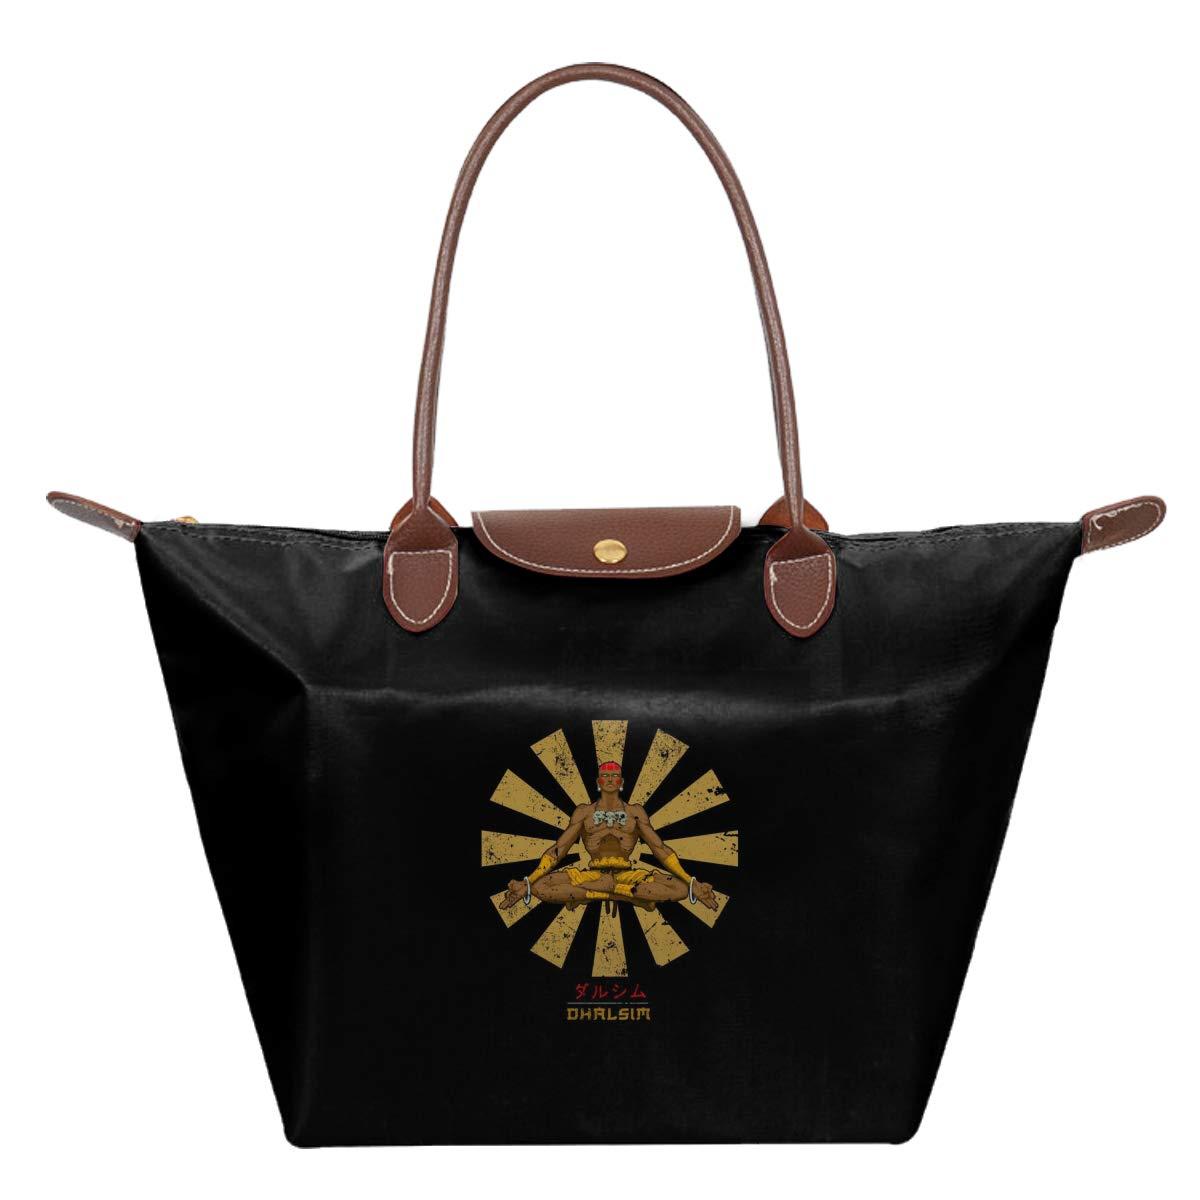 Street Fighter Dhalism Retro Japanese Waterproof Leather Folded Messenger Nylon Bag Travel Tote Hopping Folding School Handbags